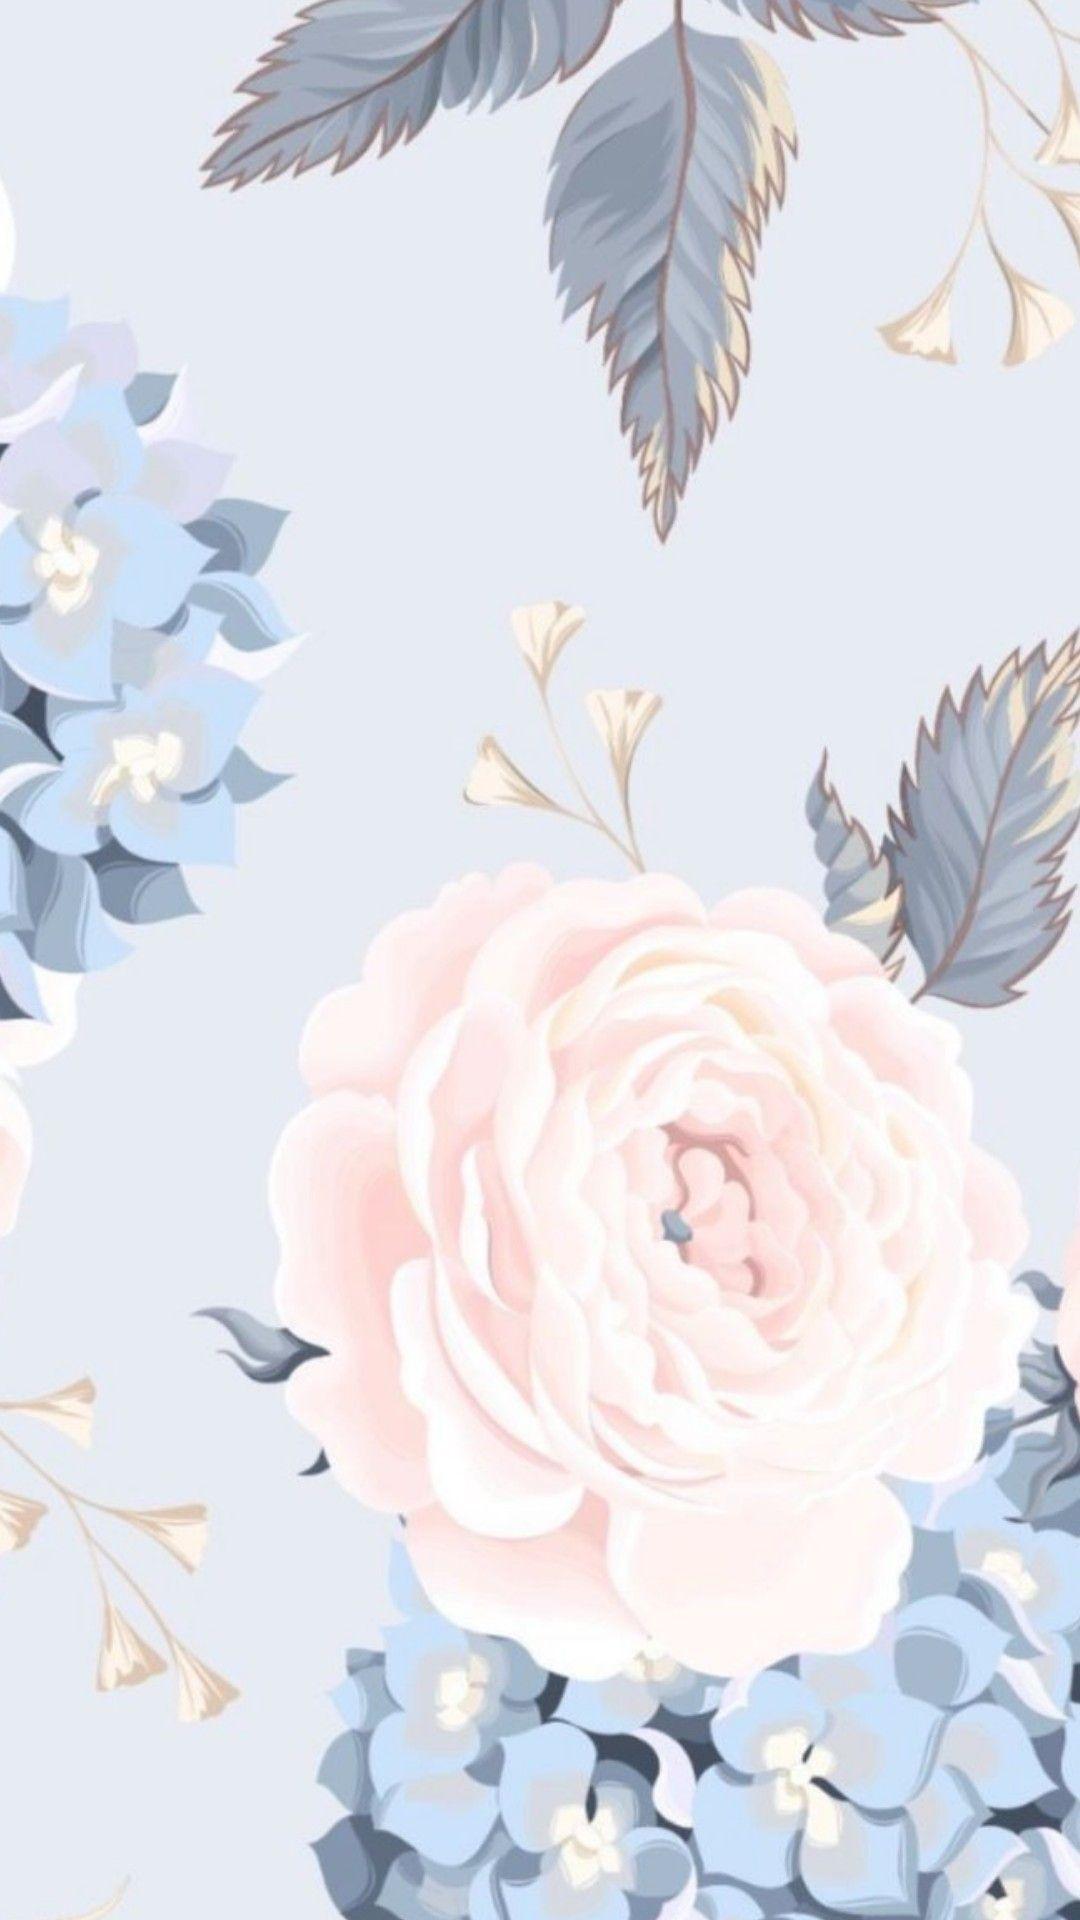 Pin By Mentari On Funnies In 2019 Flower Phone Wallpaper